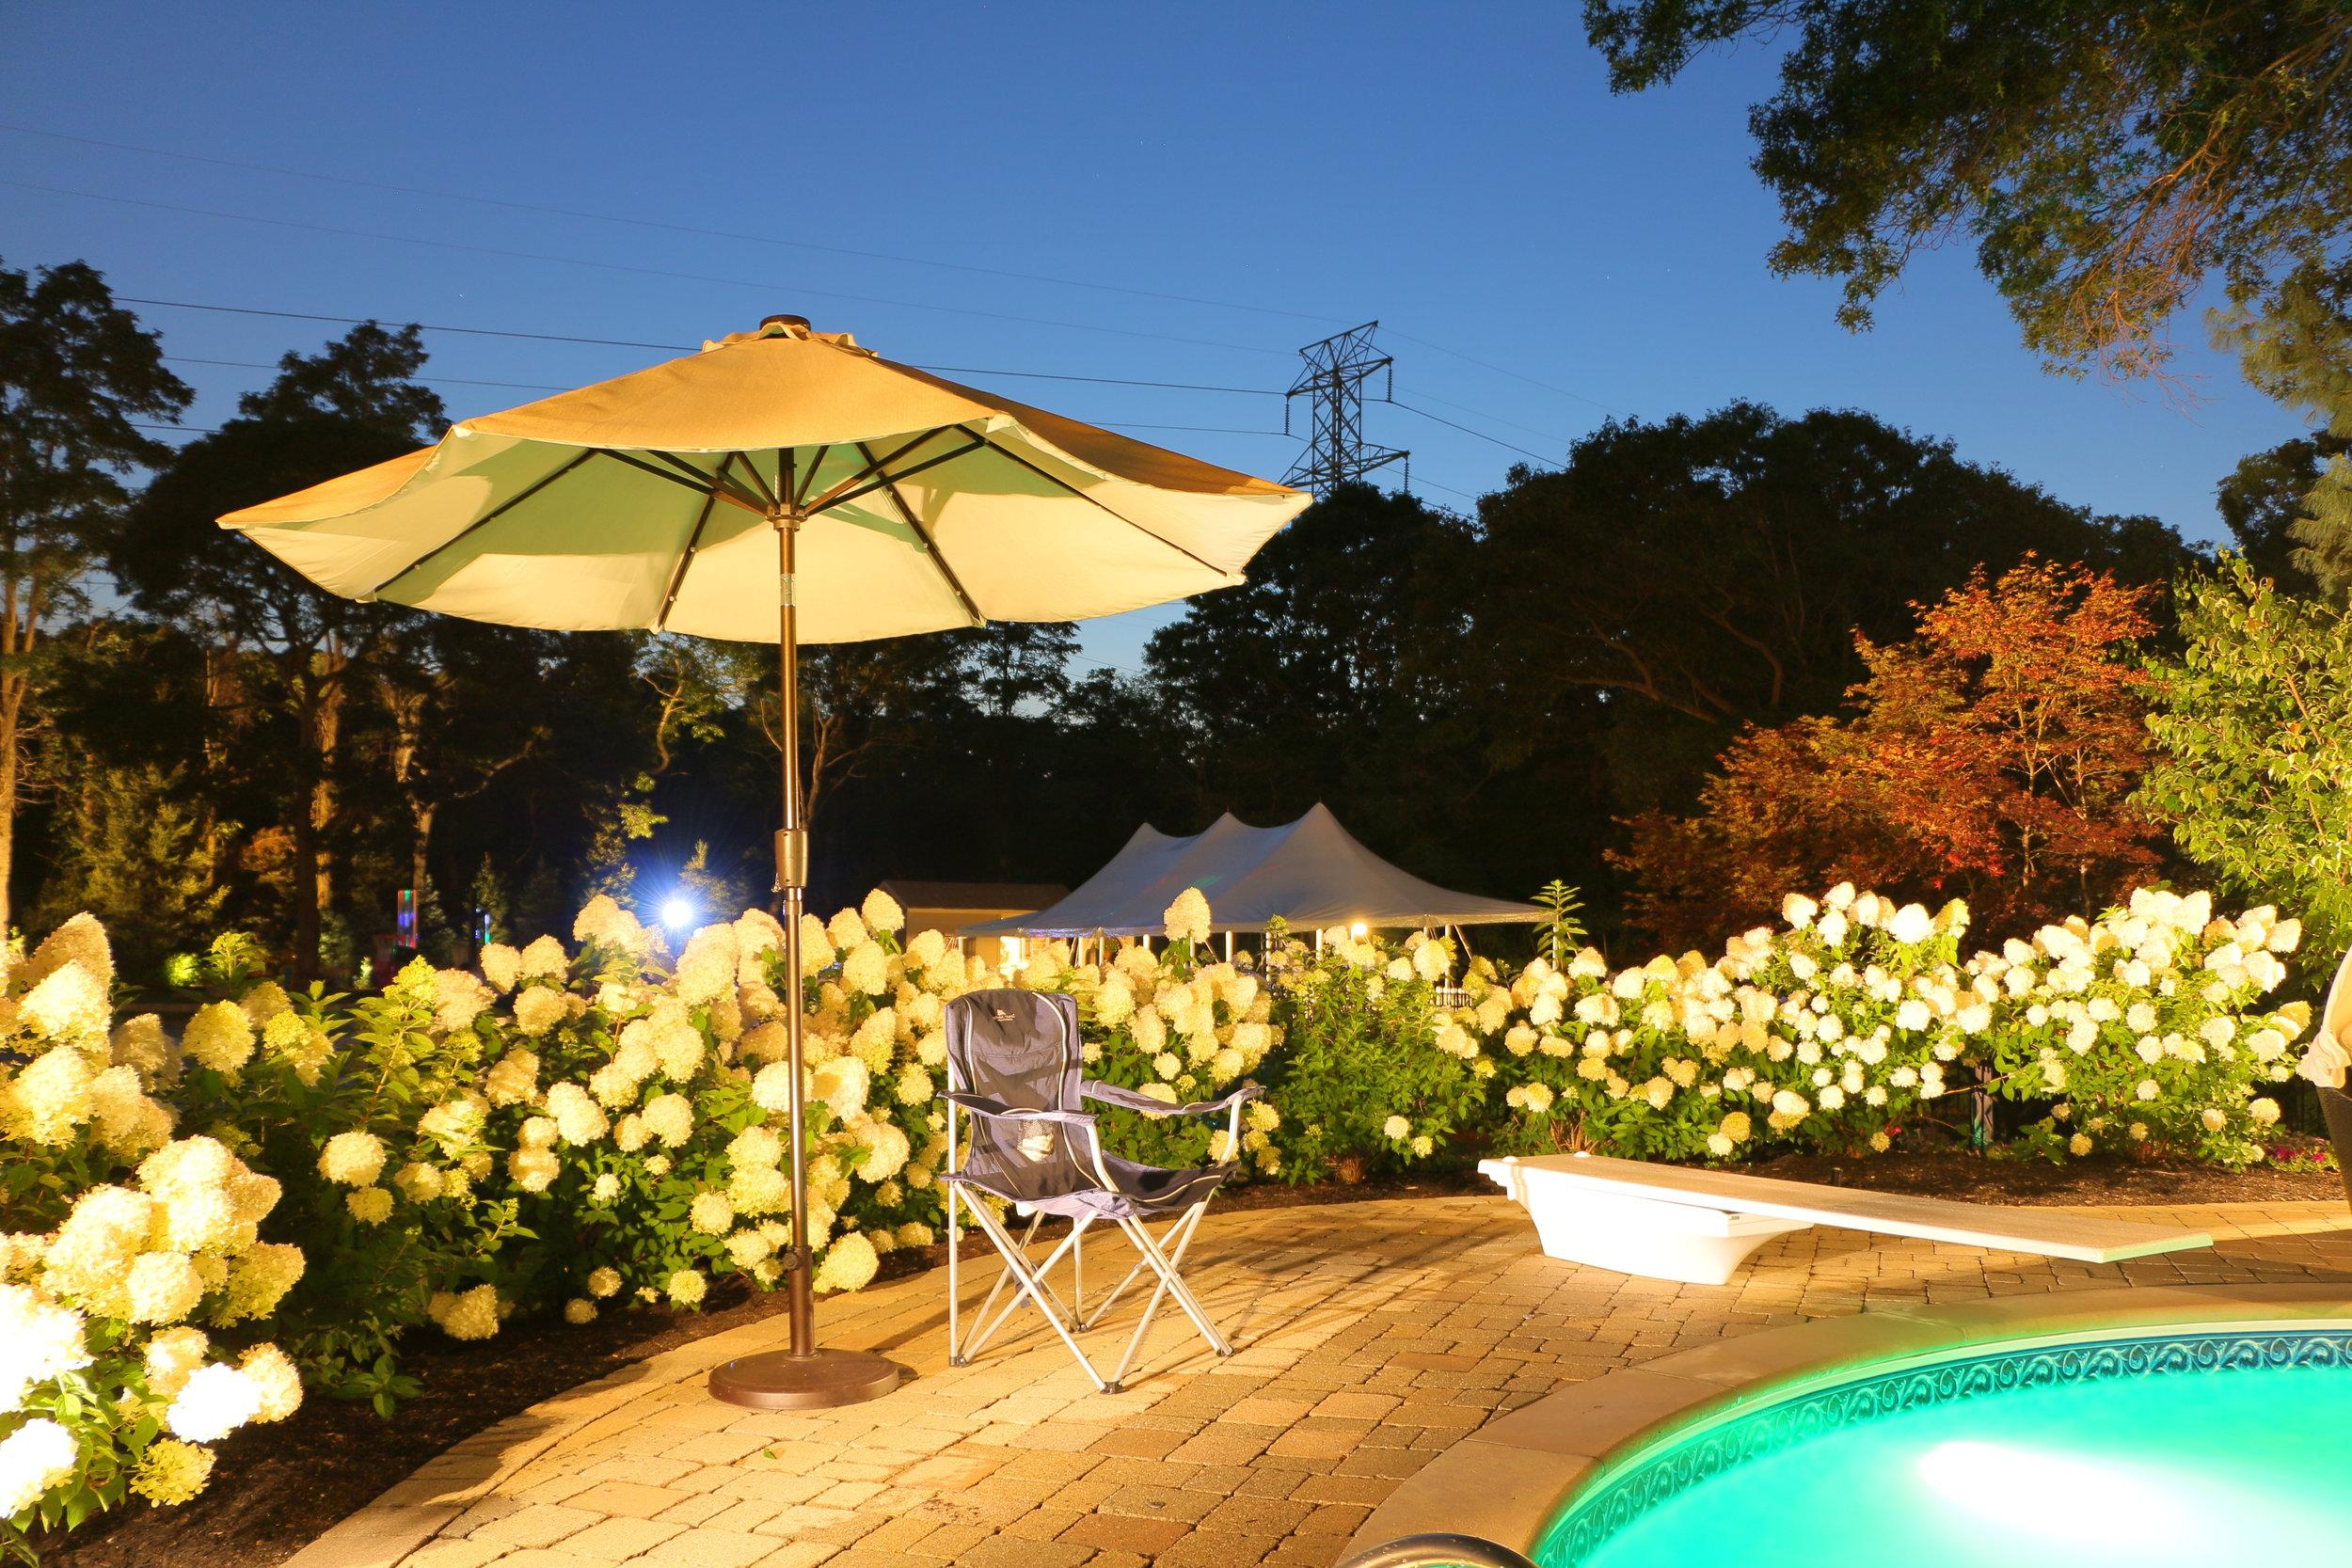 Professional pool lighting landscape design company in Long Island, NY